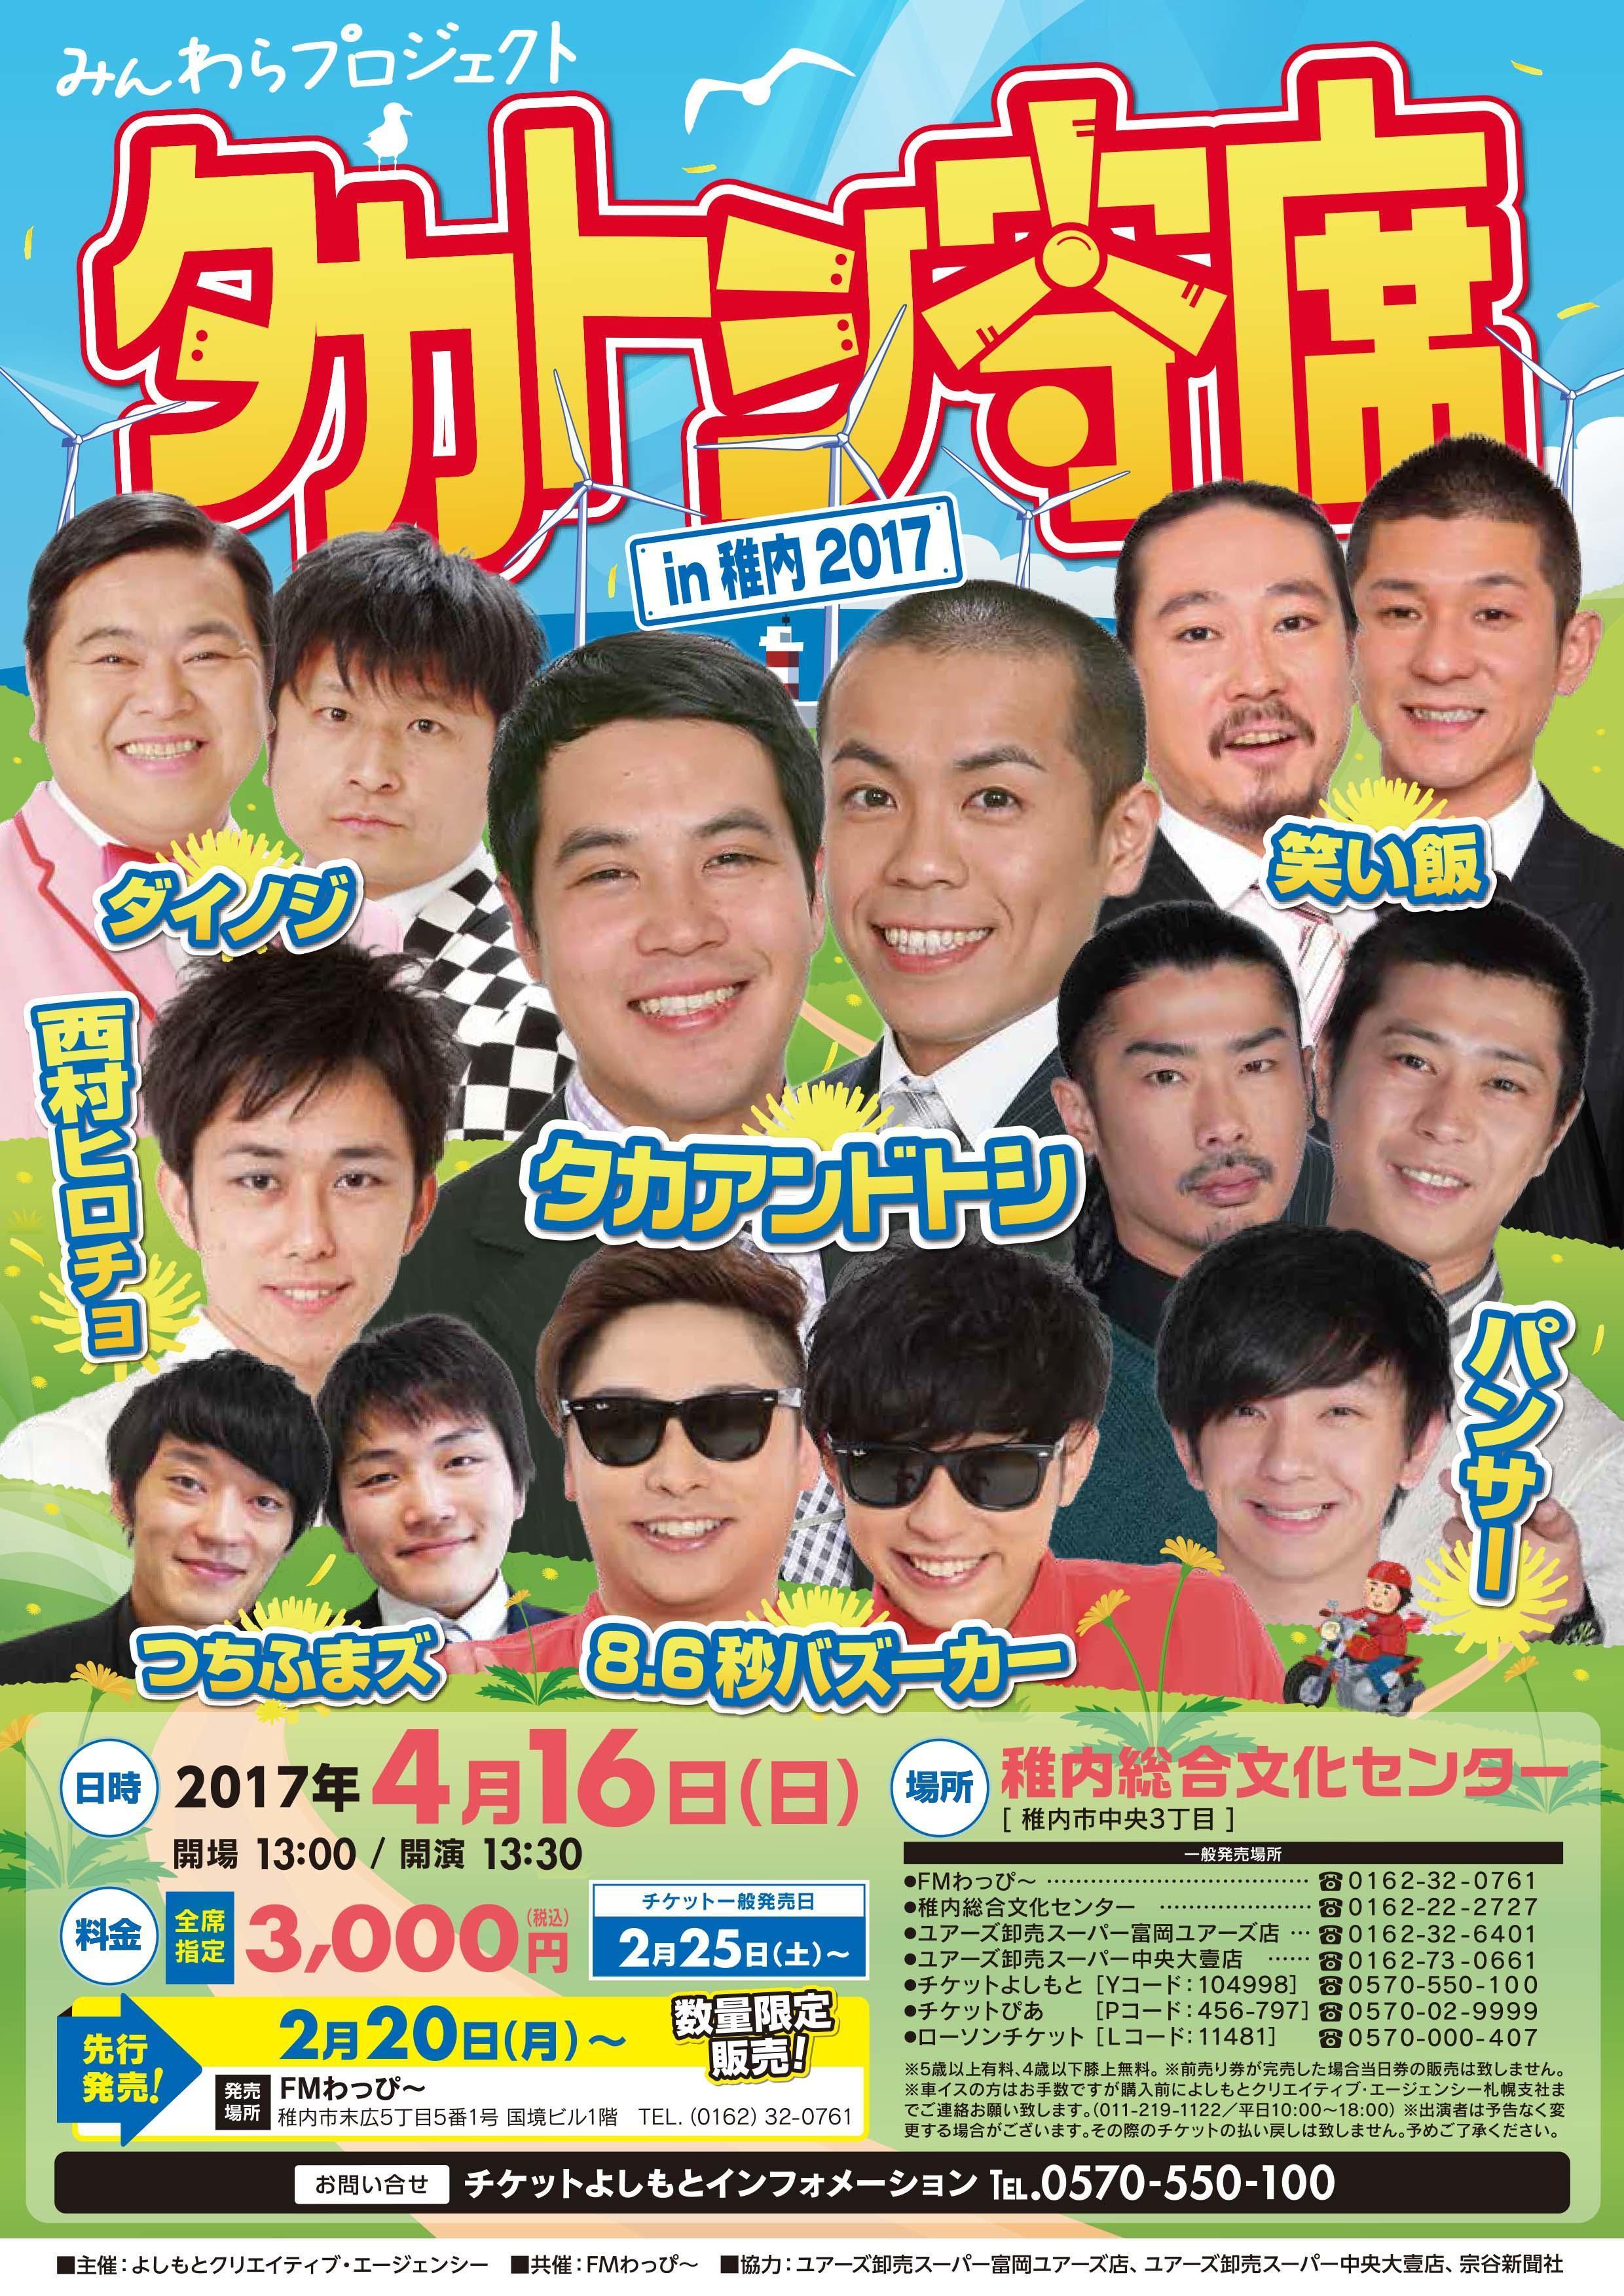 http://www.syumatsu.jp/20170210171721-92f2482a9c8170ec855223eac3d07aa39a4a8cc7.jpg